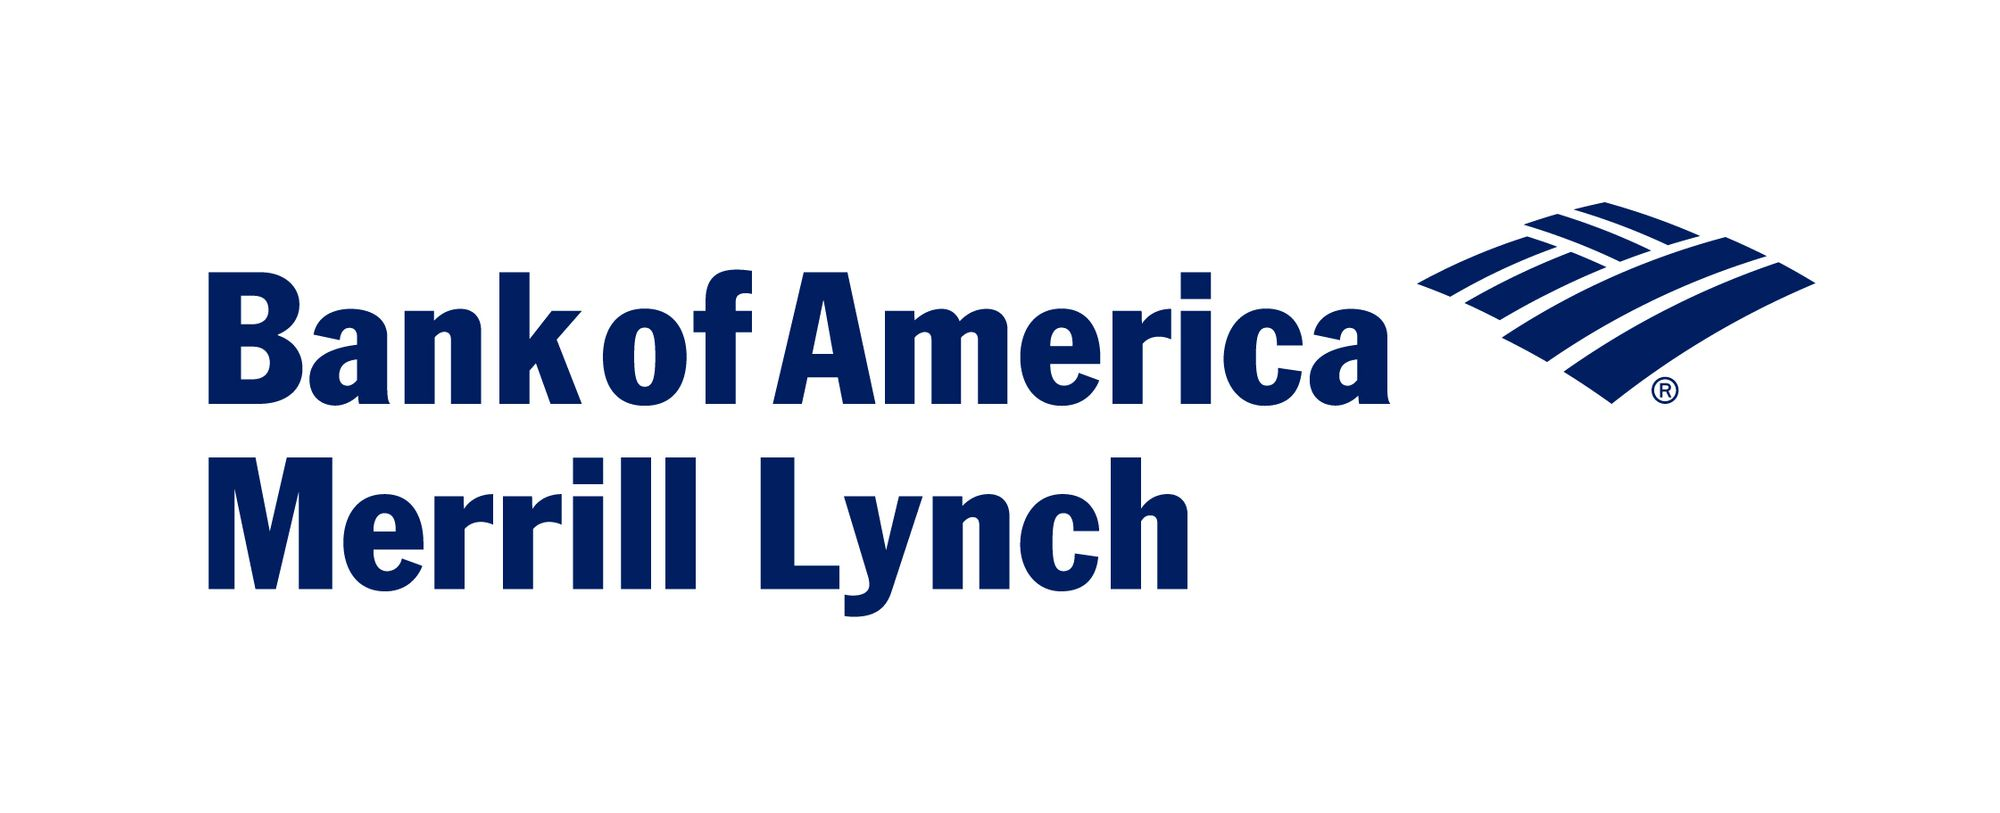 4 - bank of america merrill lynch